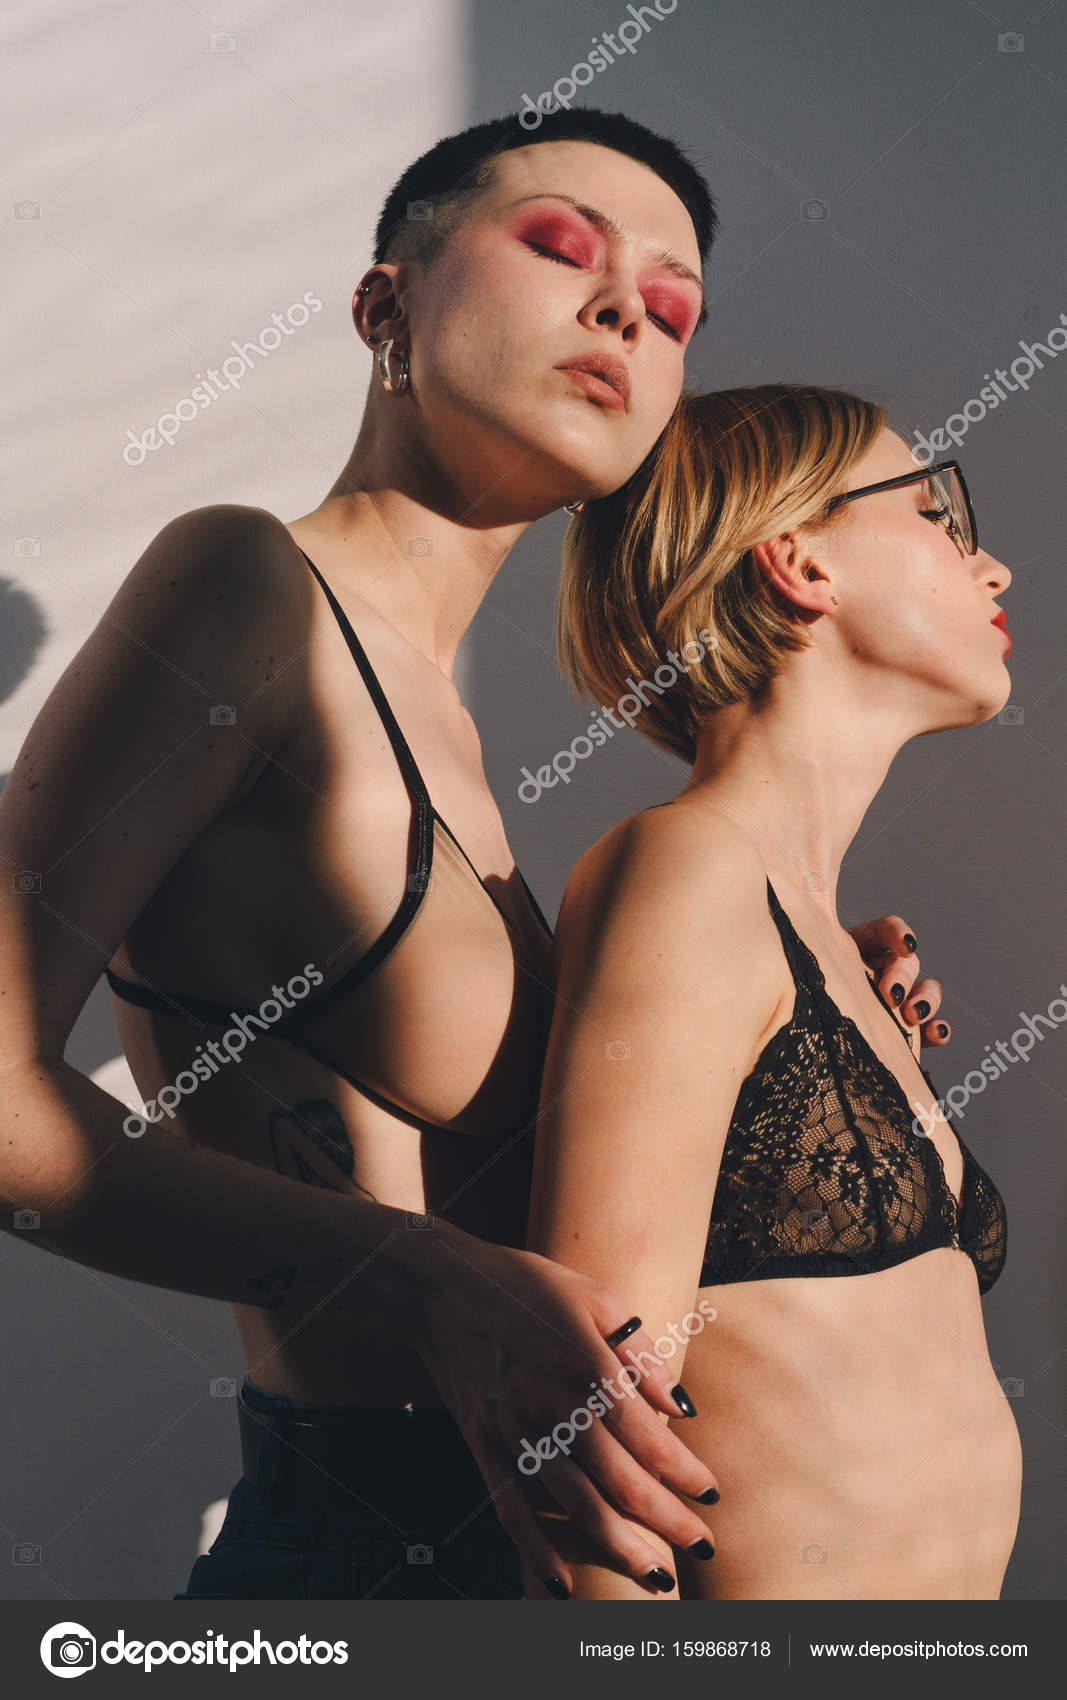 Foto gratis sensuales tias 45